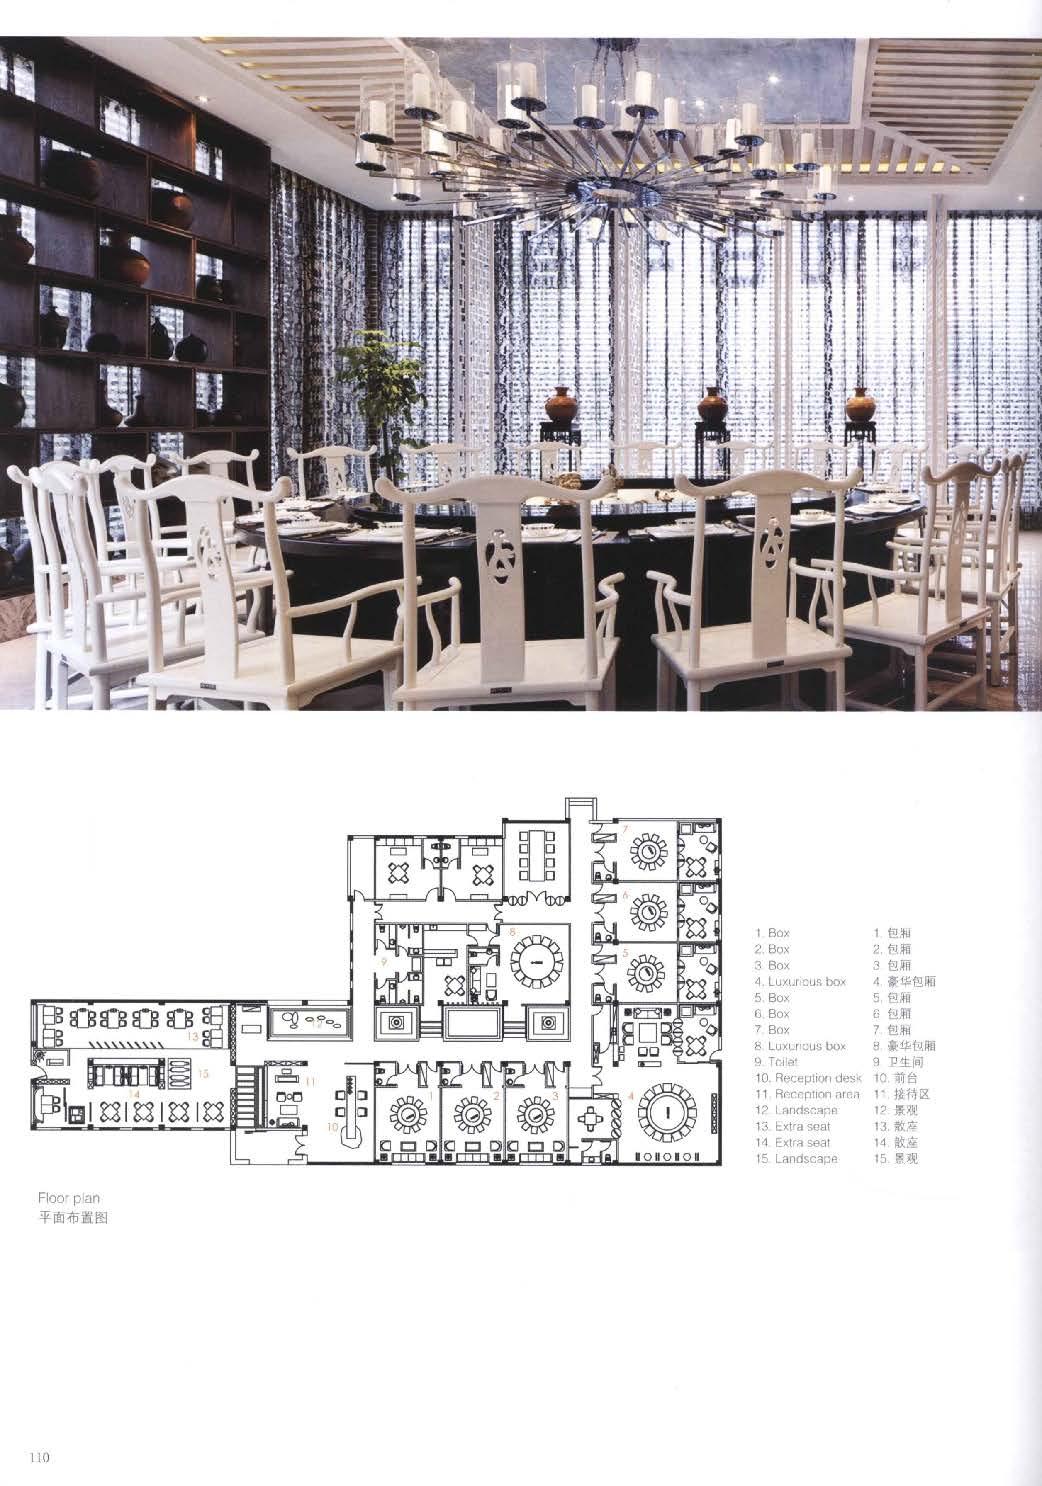 H073 东方风情 会所、餐饮细部解析_Page_108.jpg